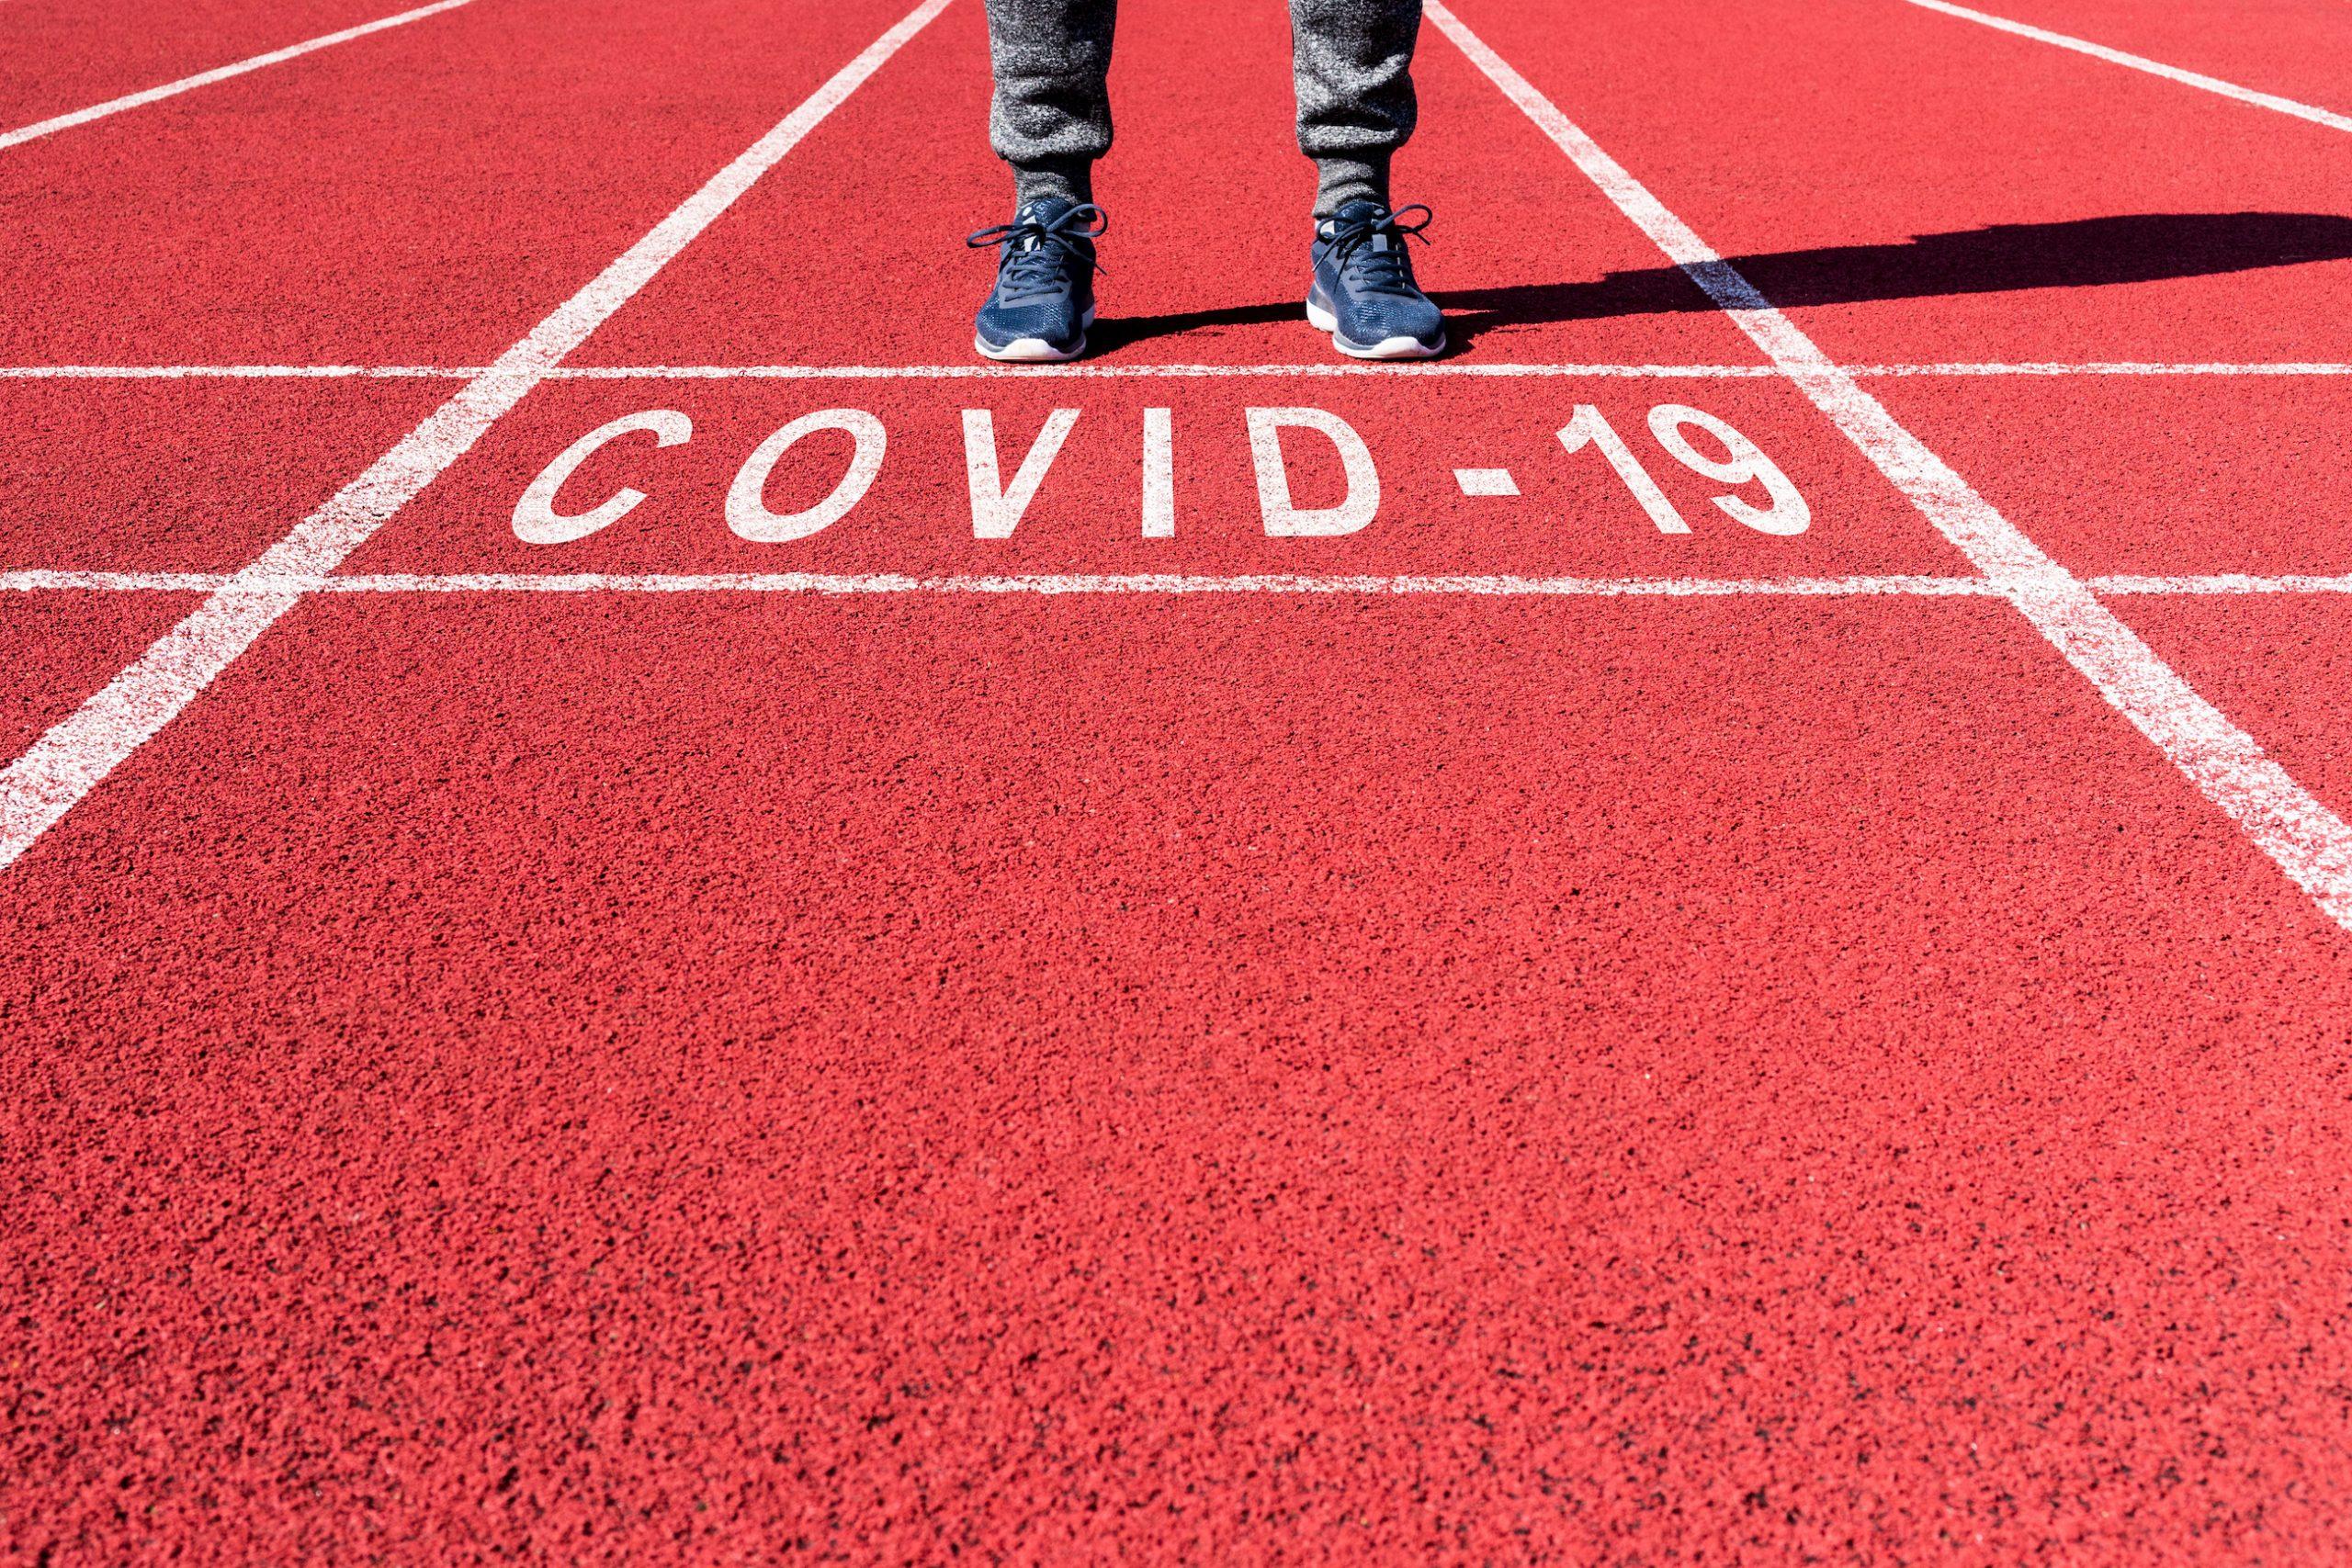 Impact of COVID-19 on sport – webinar replay